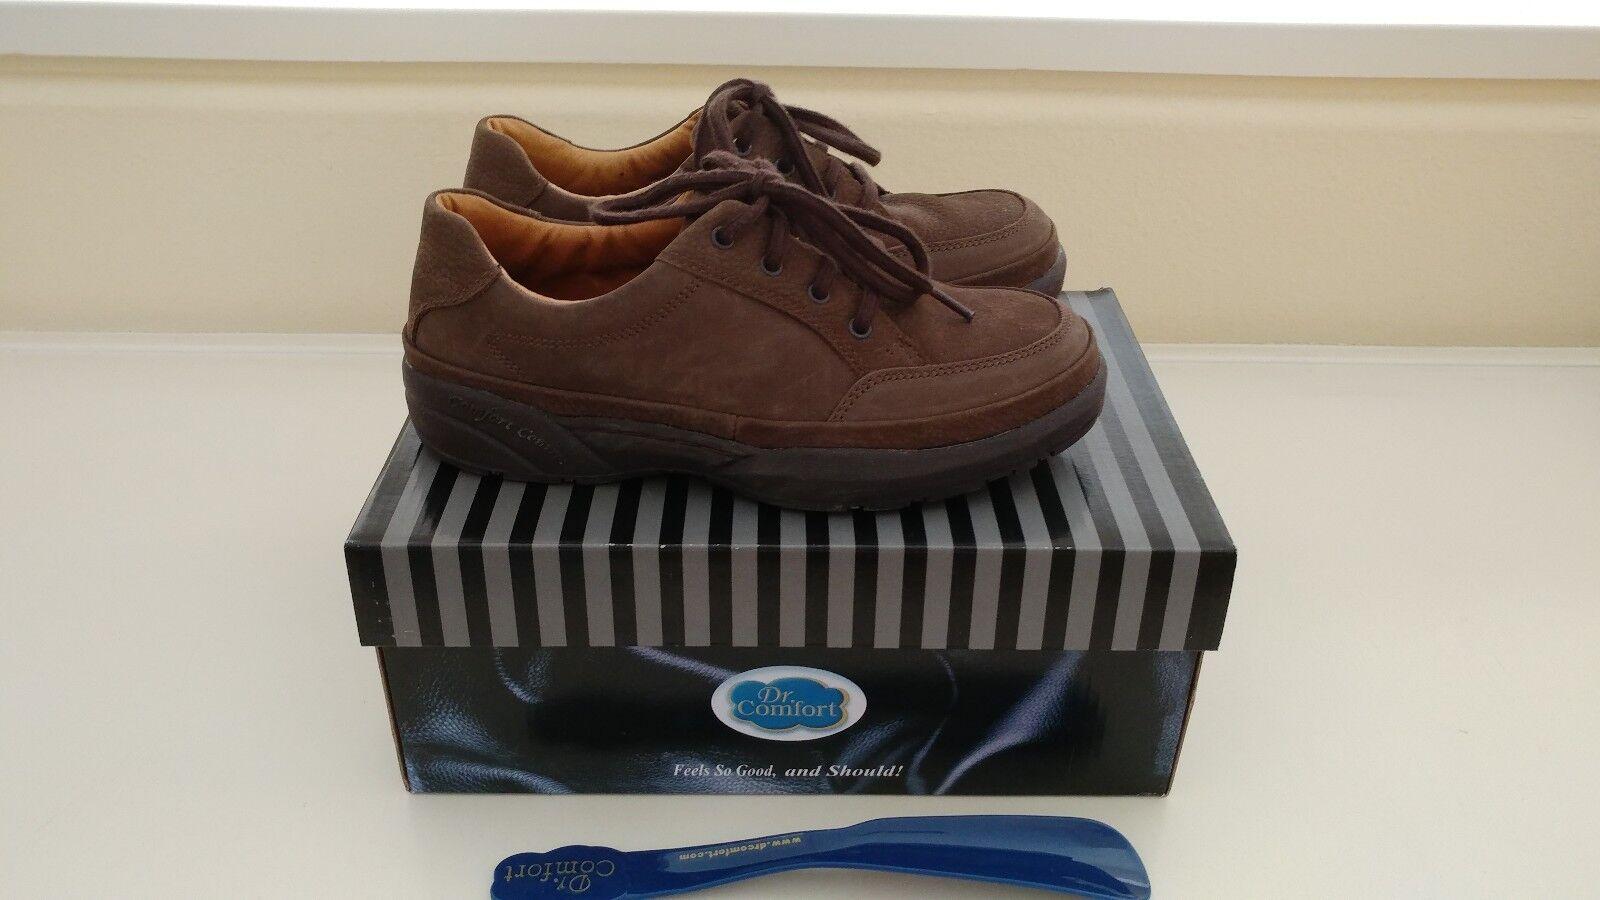 DR. COMFORT SIZE MEN'S JUSTIN CHESTNUT  BROWN SUEDE Schuhe SIZE COMFORT 7-1/2W STK# 5520 524eb4